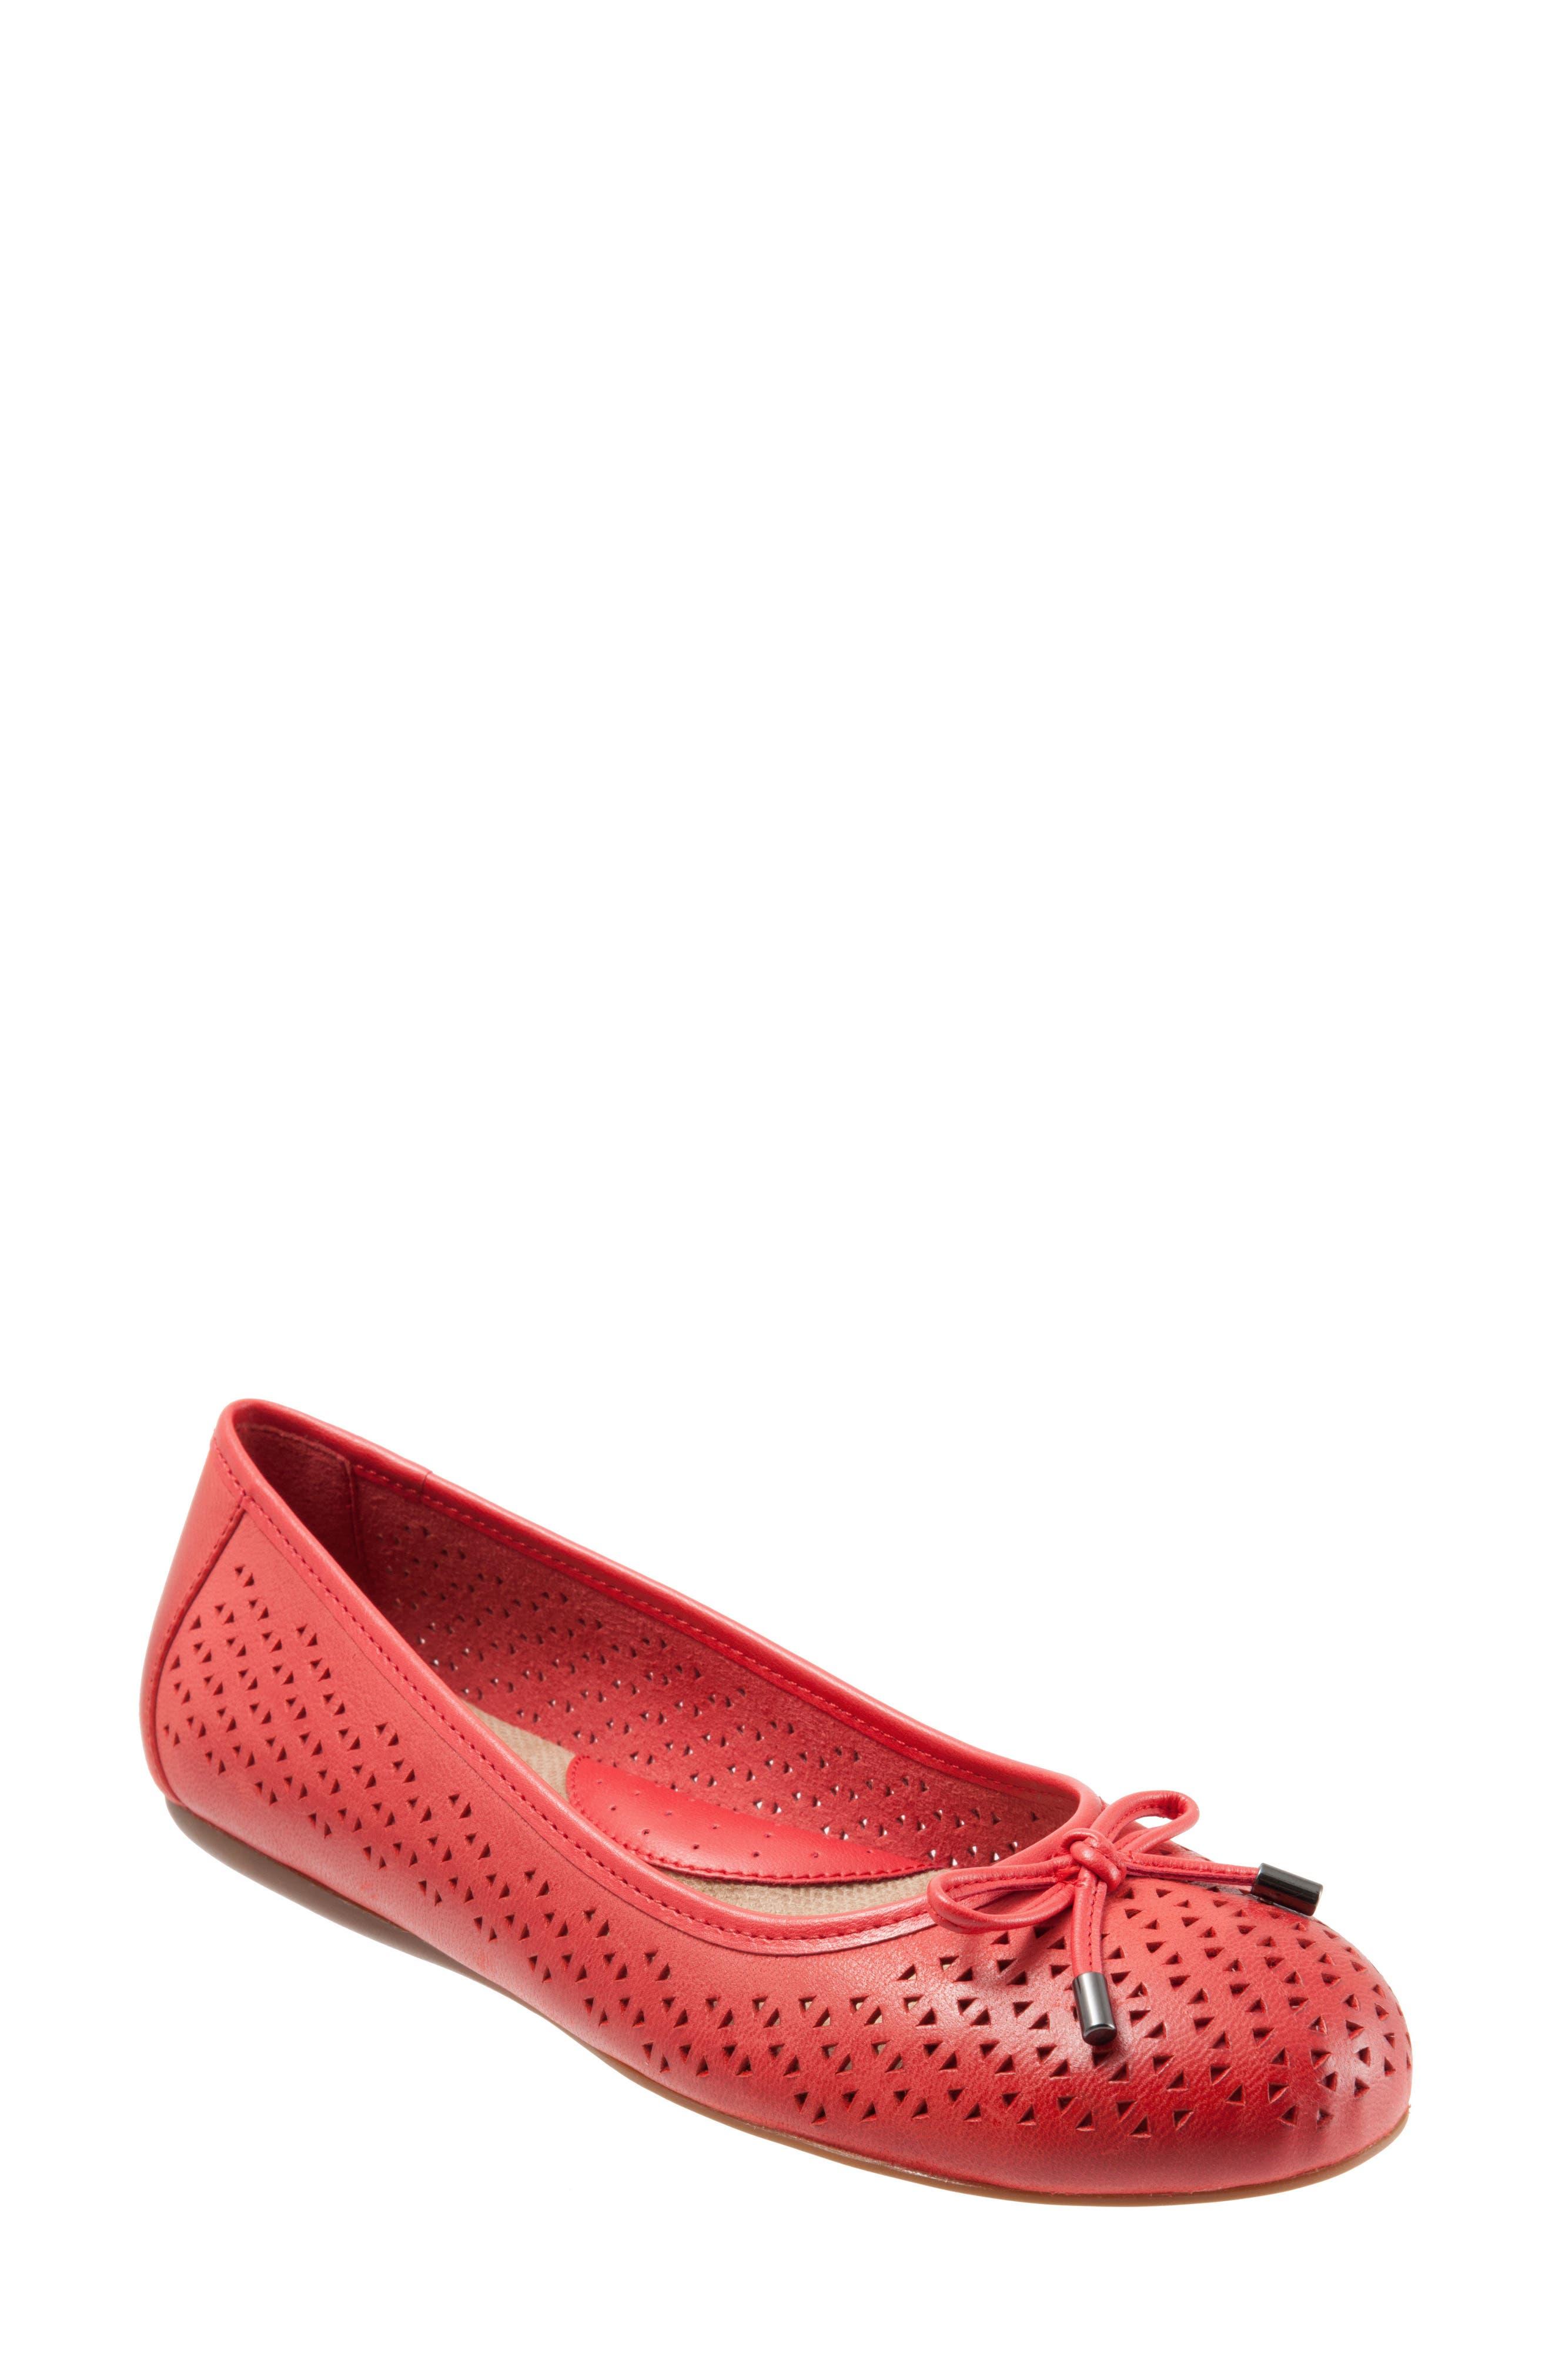 Softwalk Napa Flat, Red